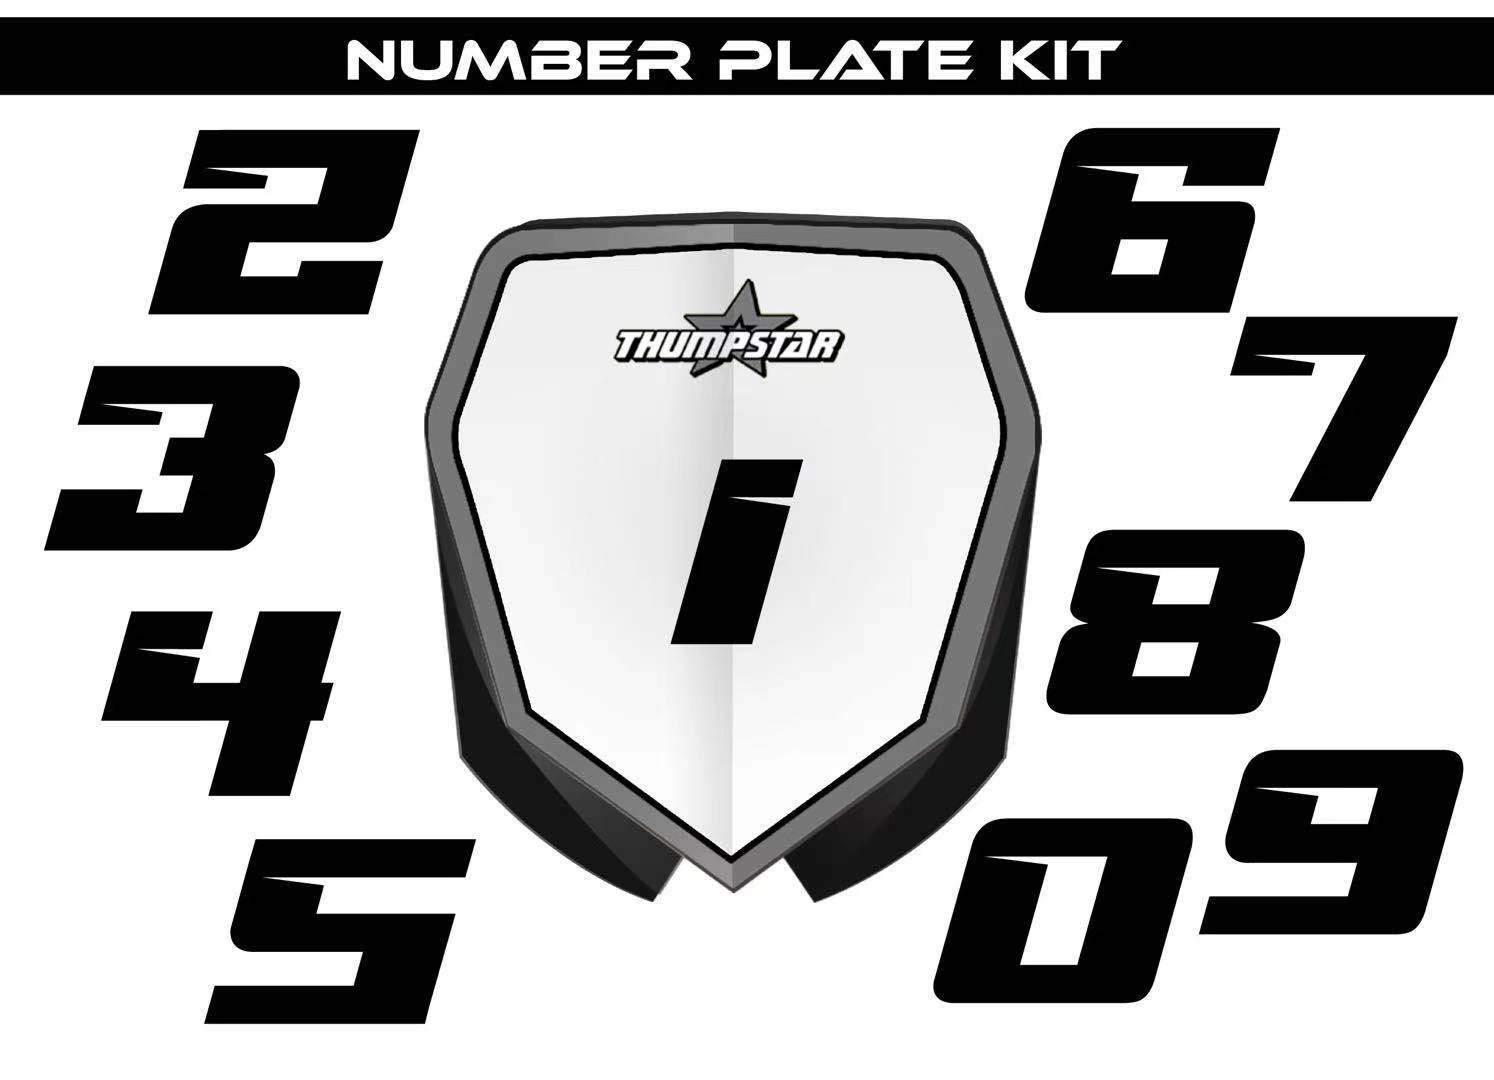 Thumpstar TSE12 Number Plate